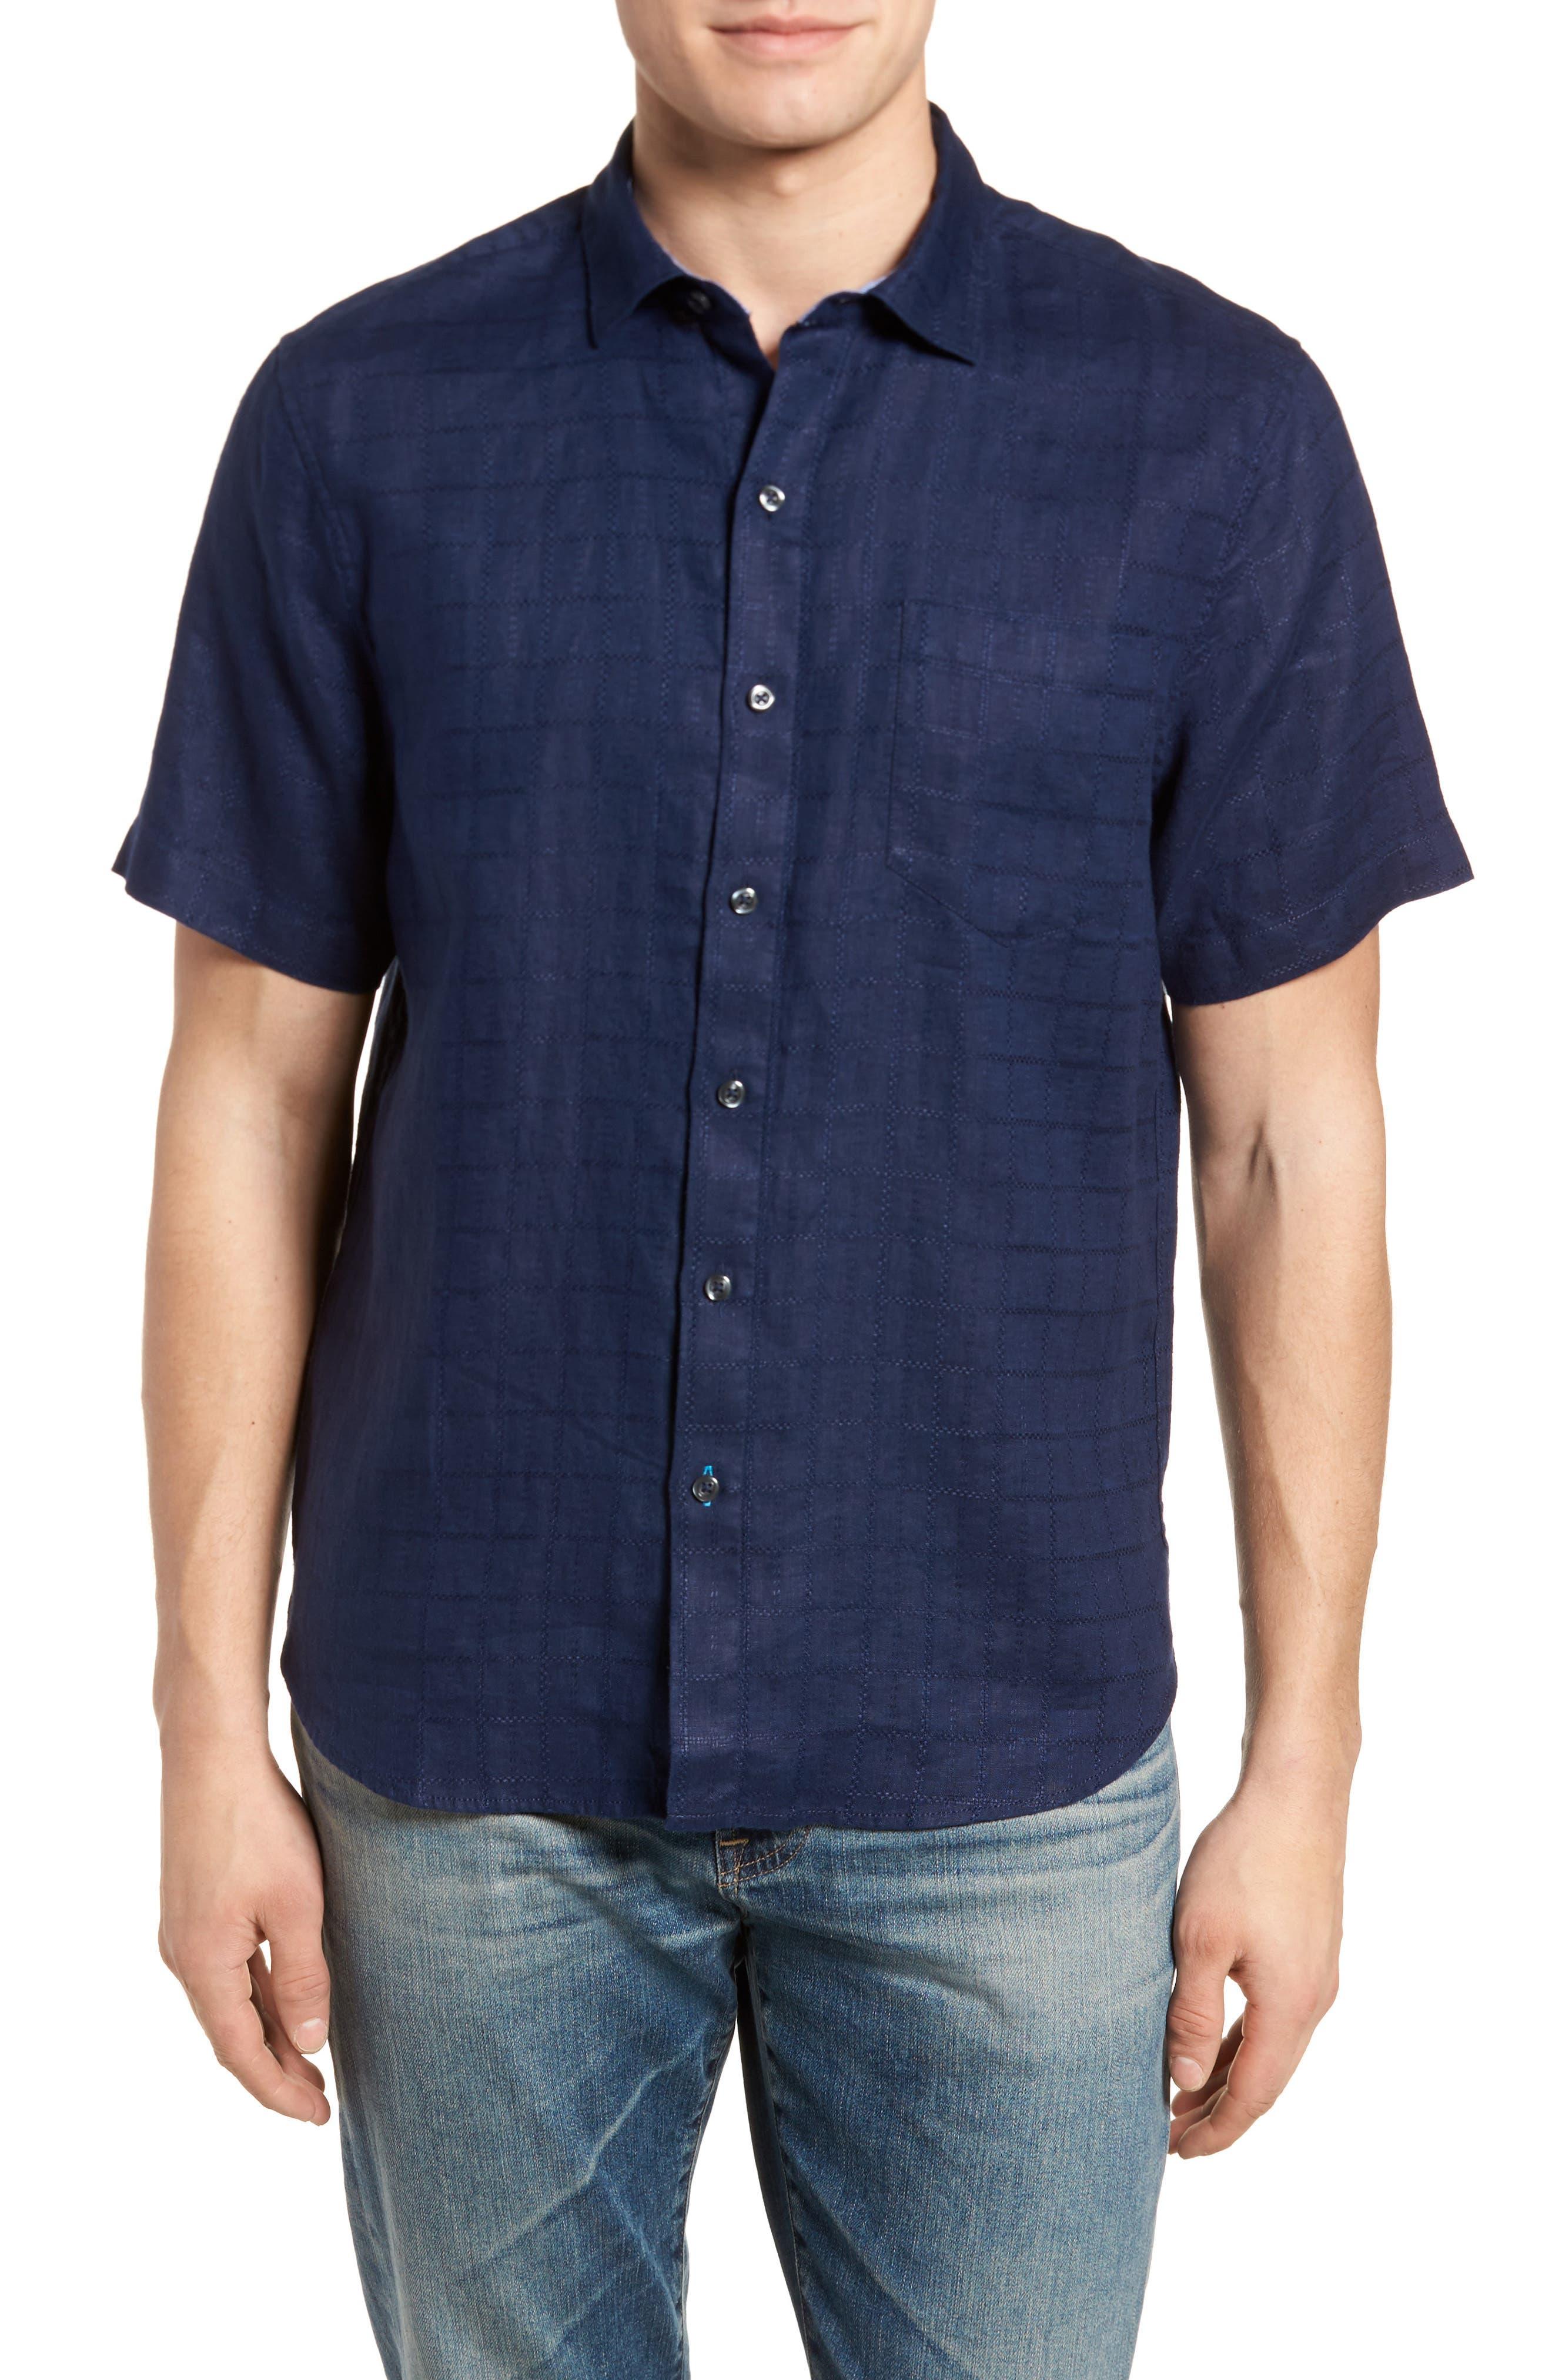 Alternate Image 1 Selected - Tommy Bahama Costa Sera Linen Sport Shirt